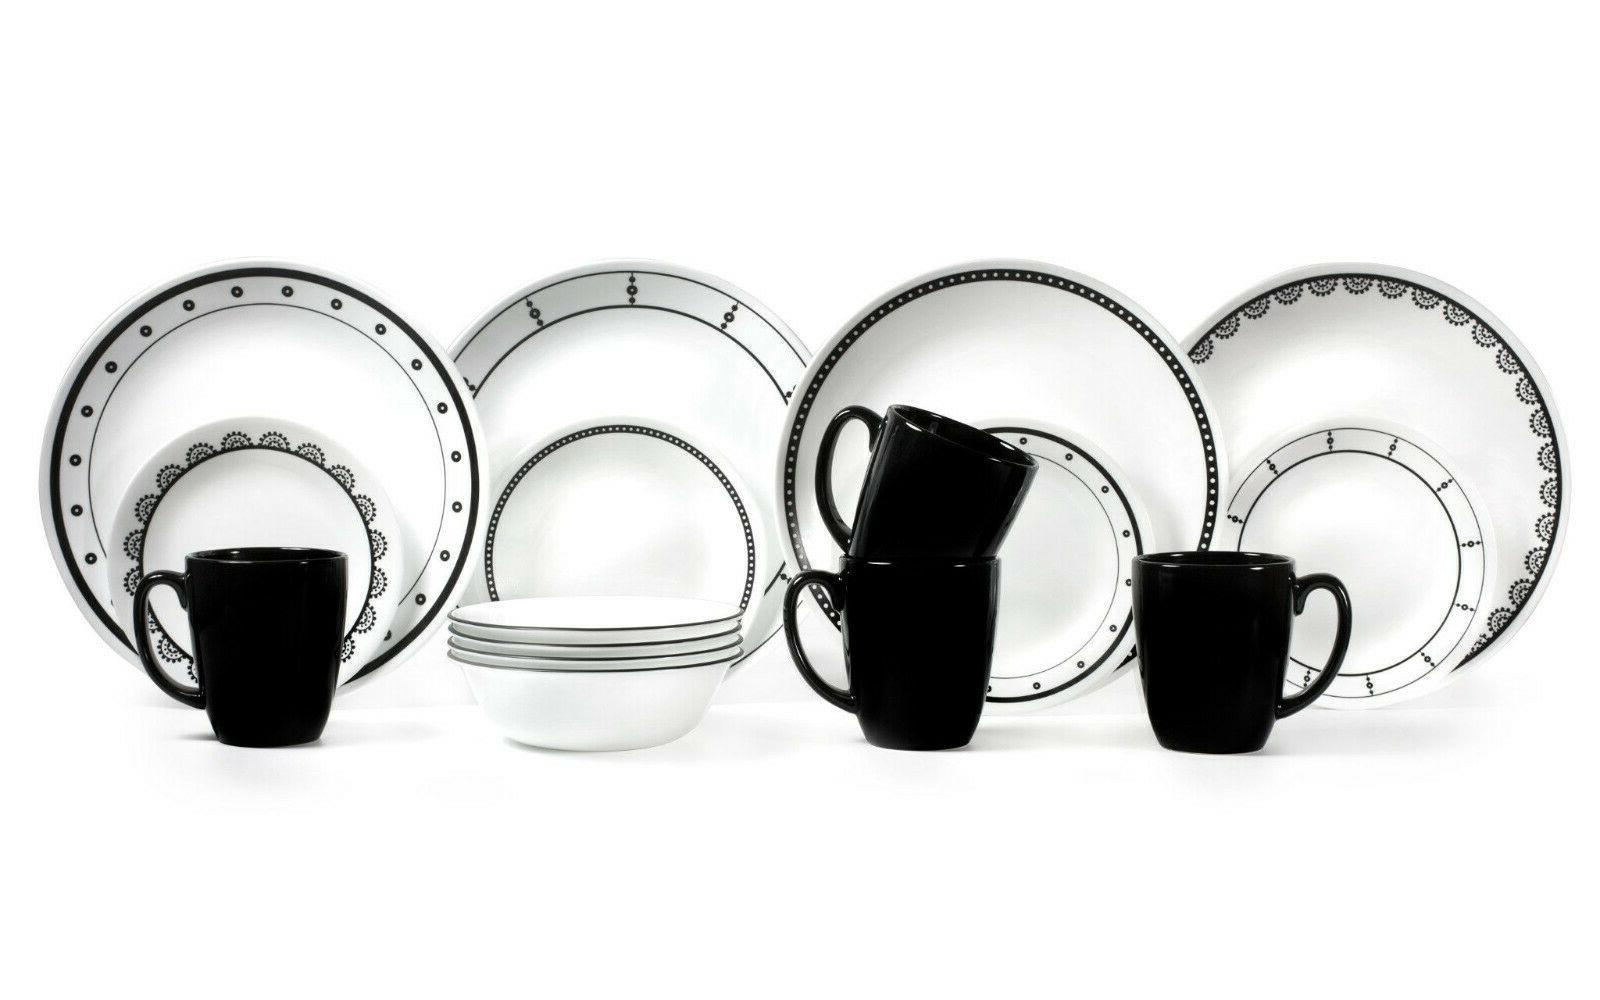 16 Piece Dinnerware Set Lightweight Dinning Plates Bowls Mug